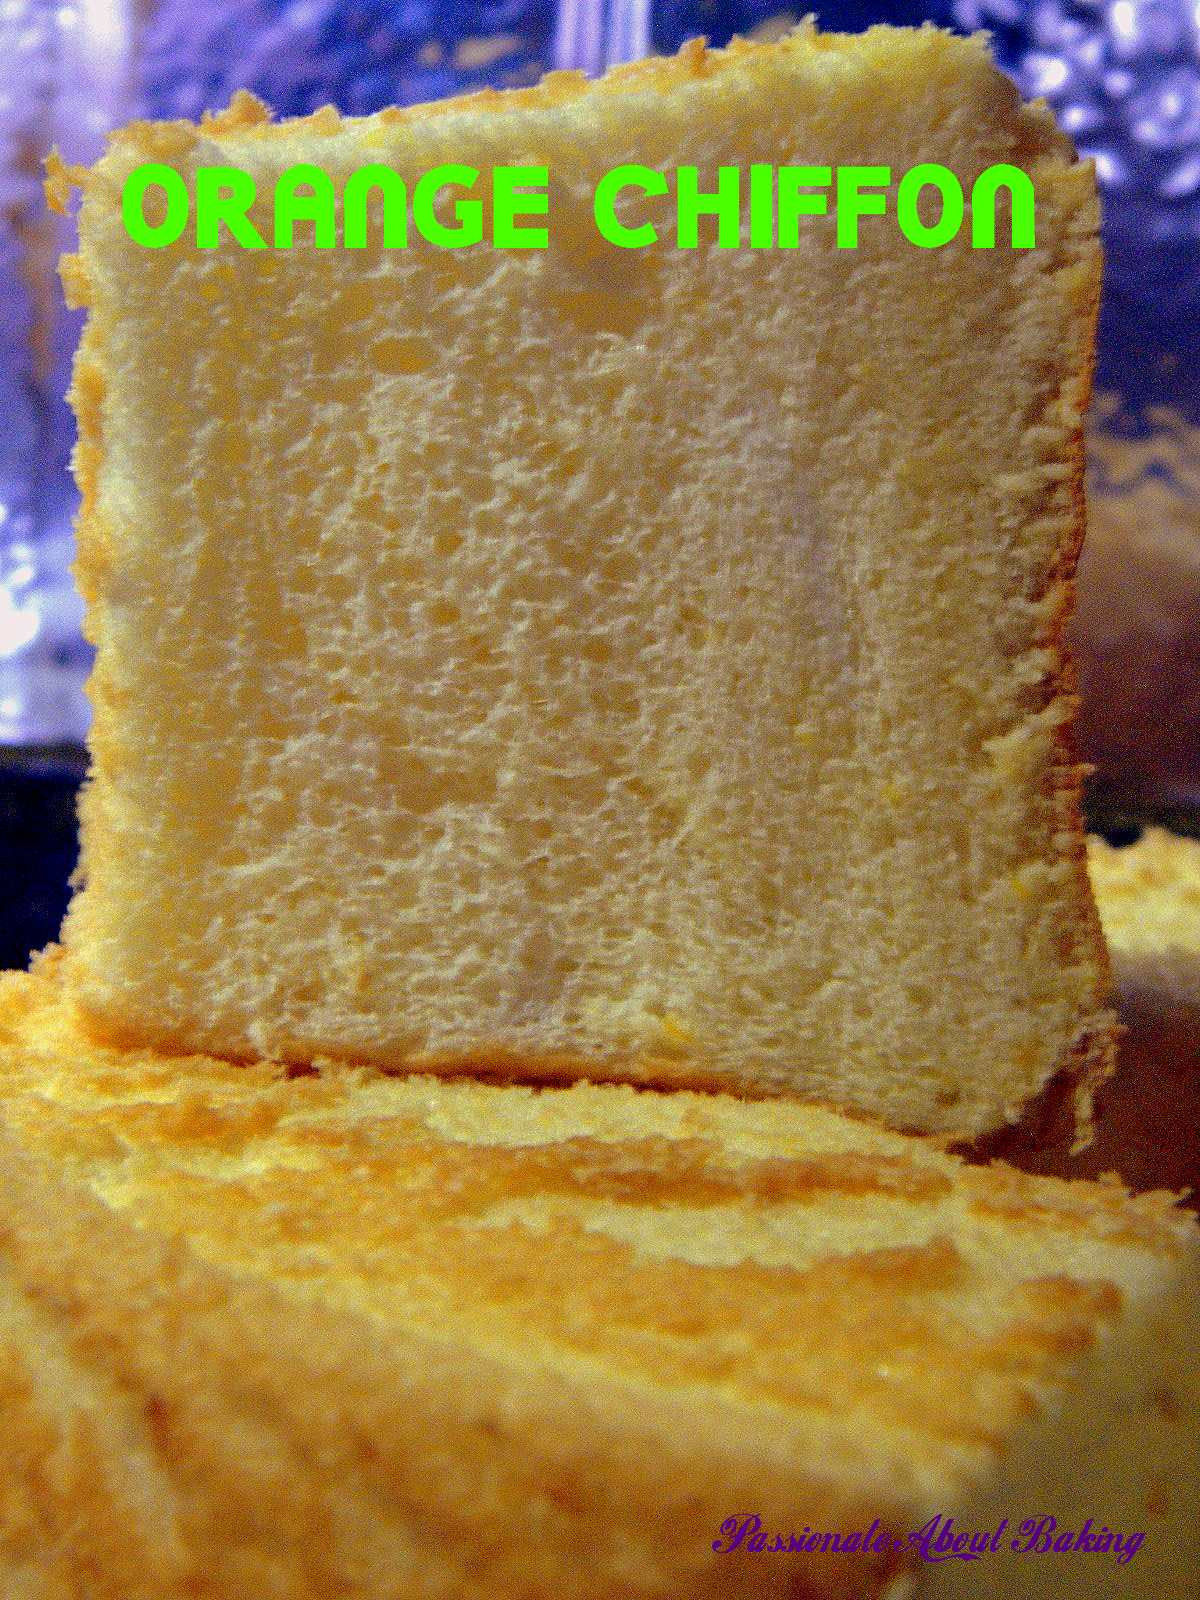 Grand Marnier Orange Chiffon Cake Recipe